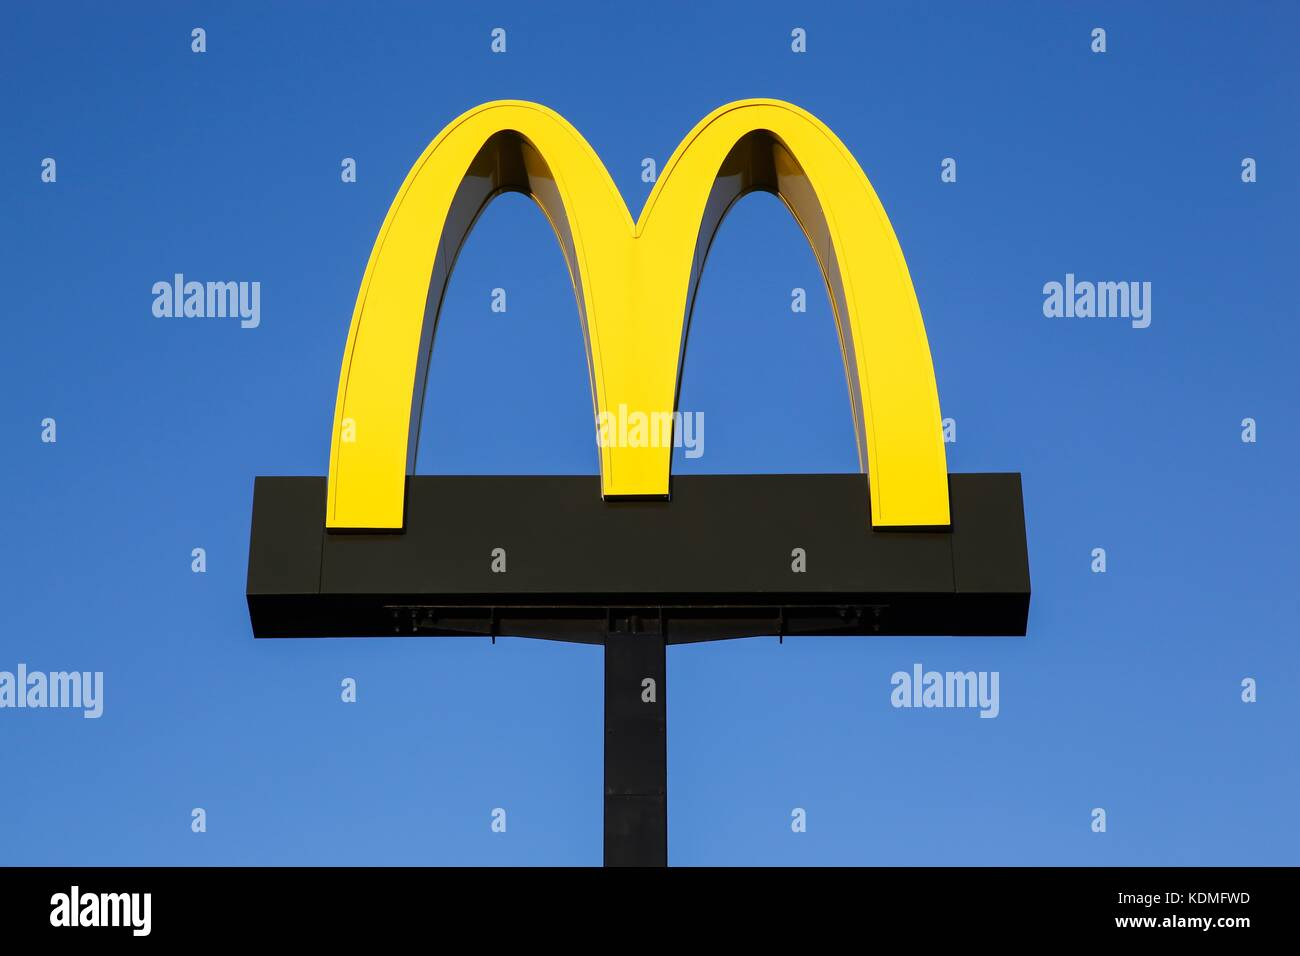 Mcdonalds Logo Board Stock Photos Mcdonalds Logo Board Stock